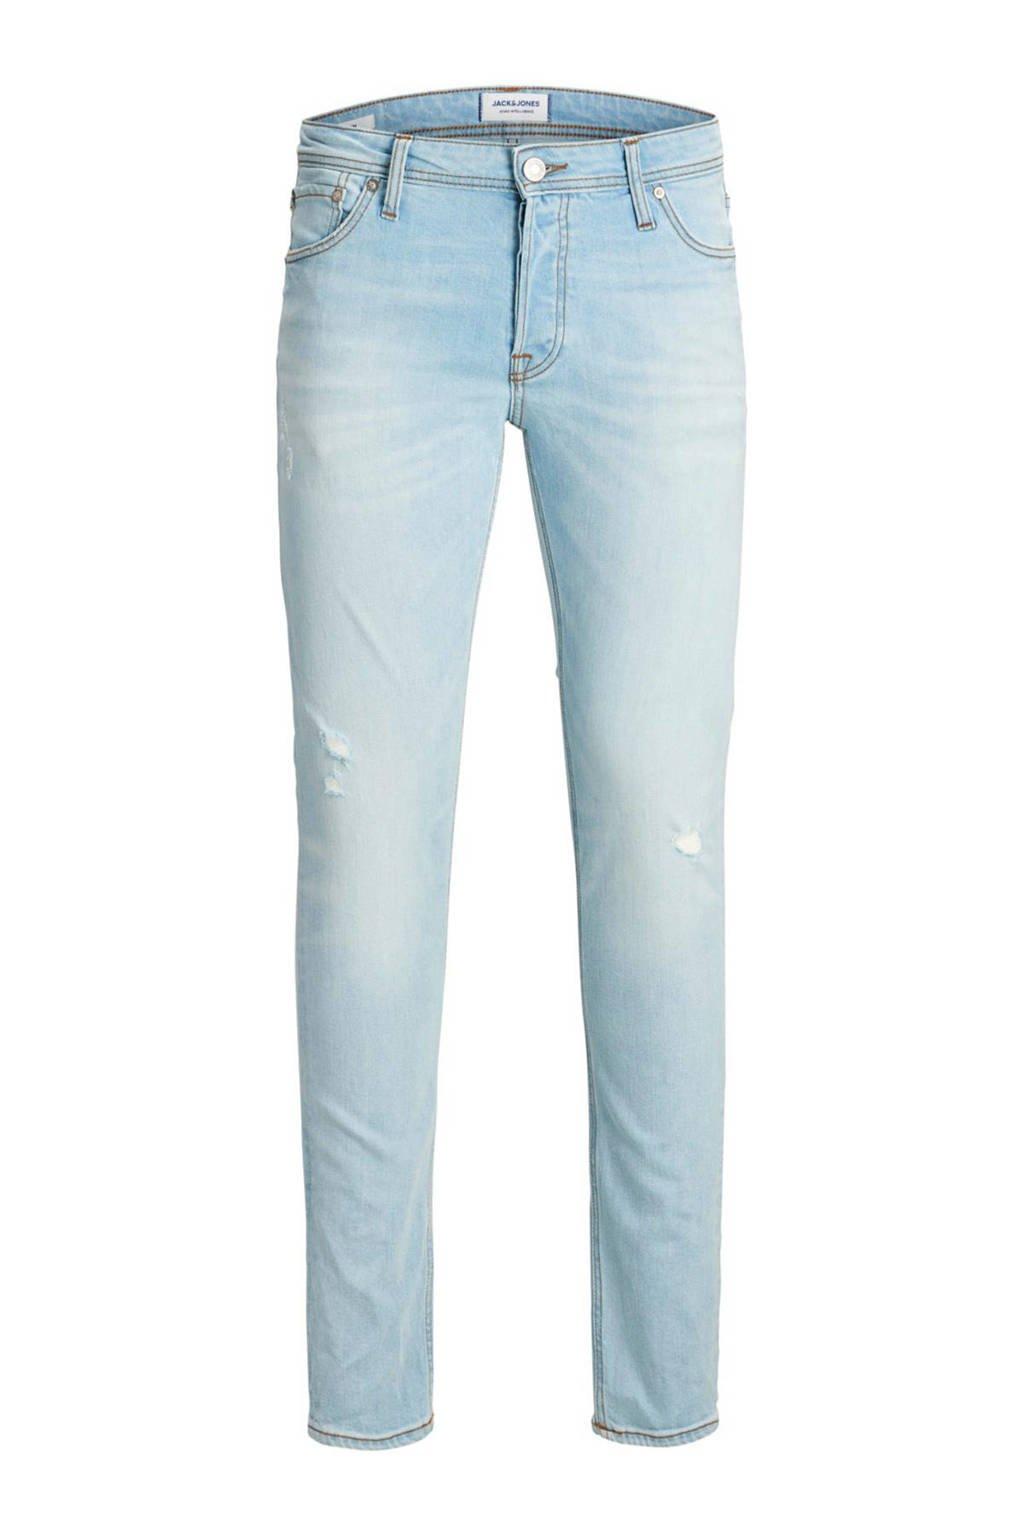 JACK & JONES slim fit jeans, Blue denim